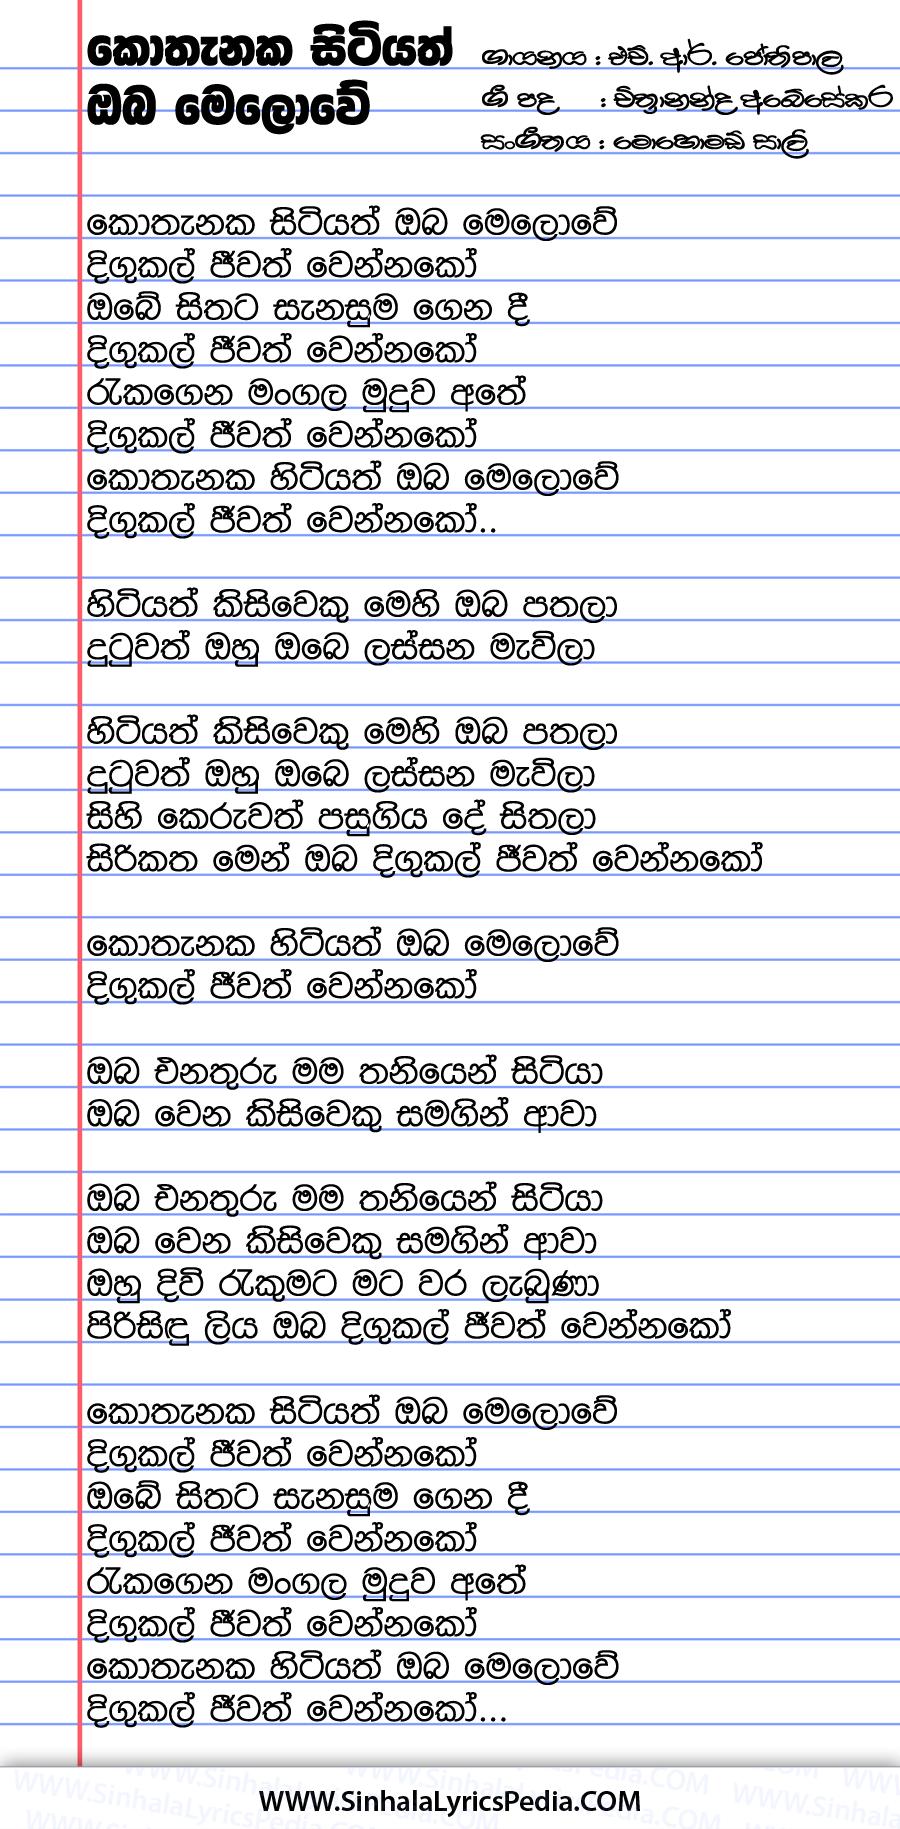 Kothanaka Sitiyath Oba Melowe Song Lyrics